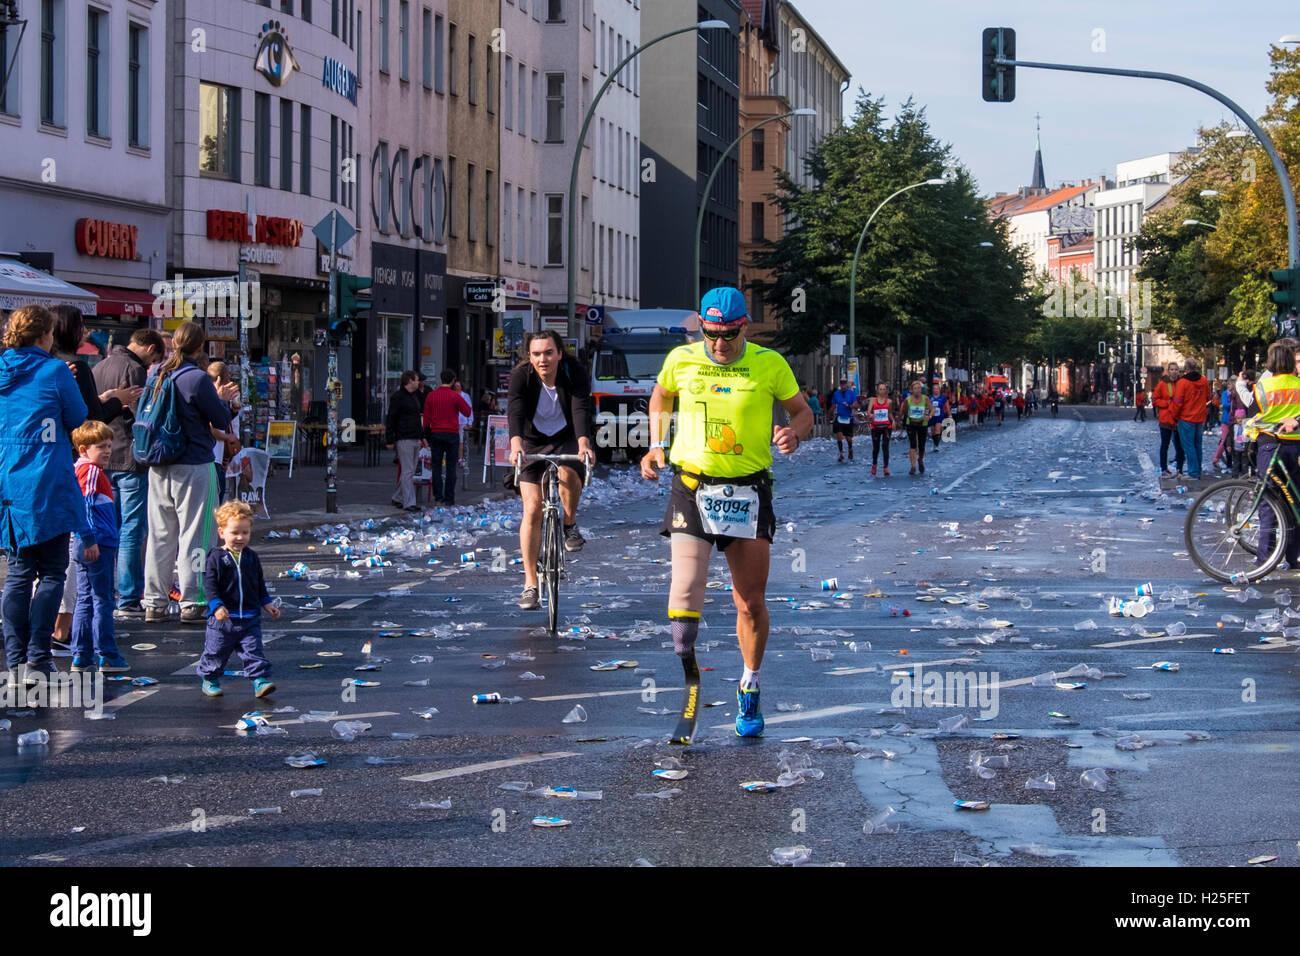 Berlin, Germany, 25th September, 2016. Blade-runner in the Berlin Marathon at the 10 Kilometer mark at Rosenthalerplatz. - Stock Image